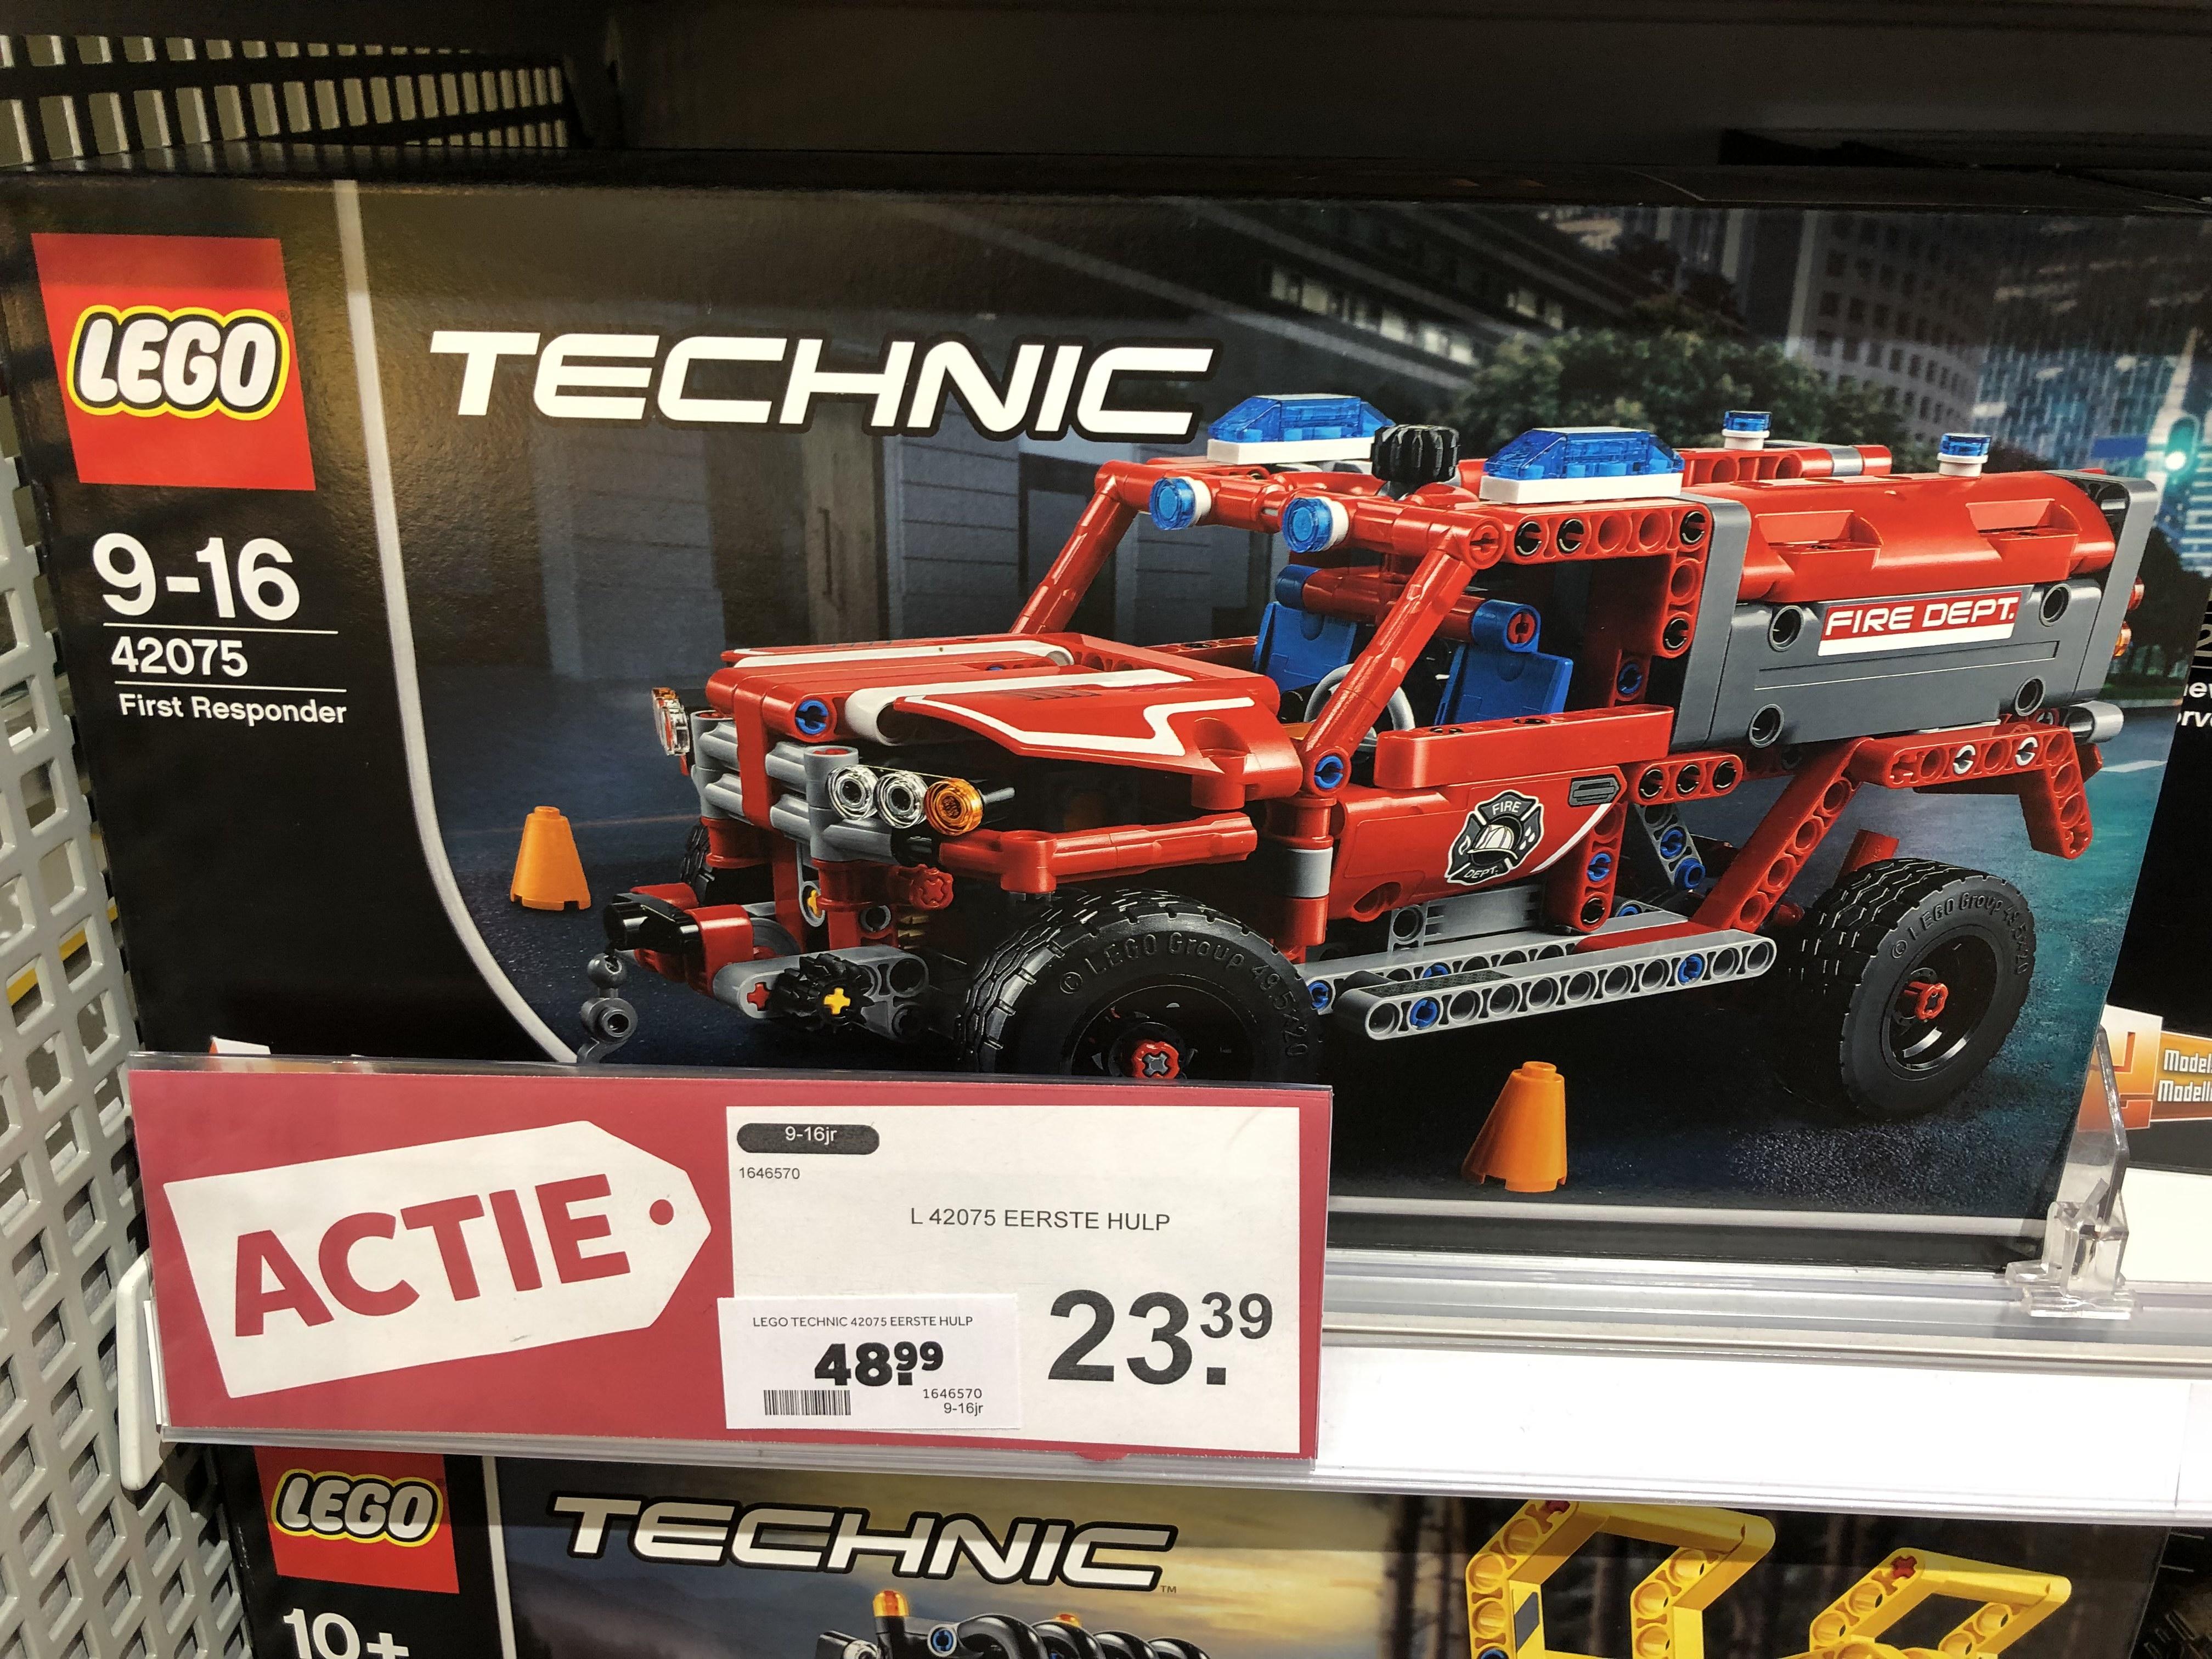 Intertoys technic Lego 42075